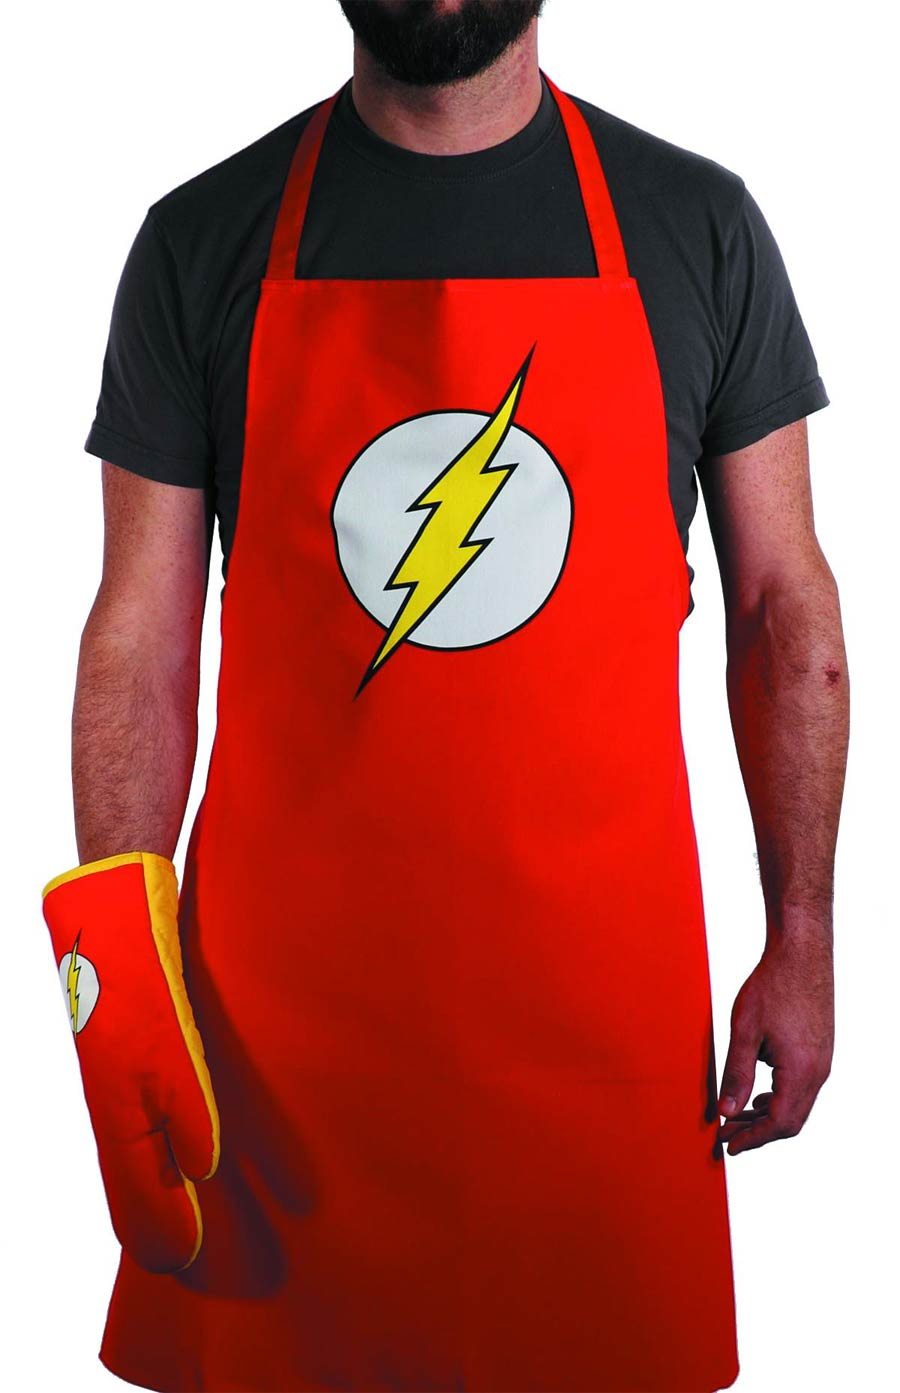 DC Heroes Apron & Glove Set - Flash